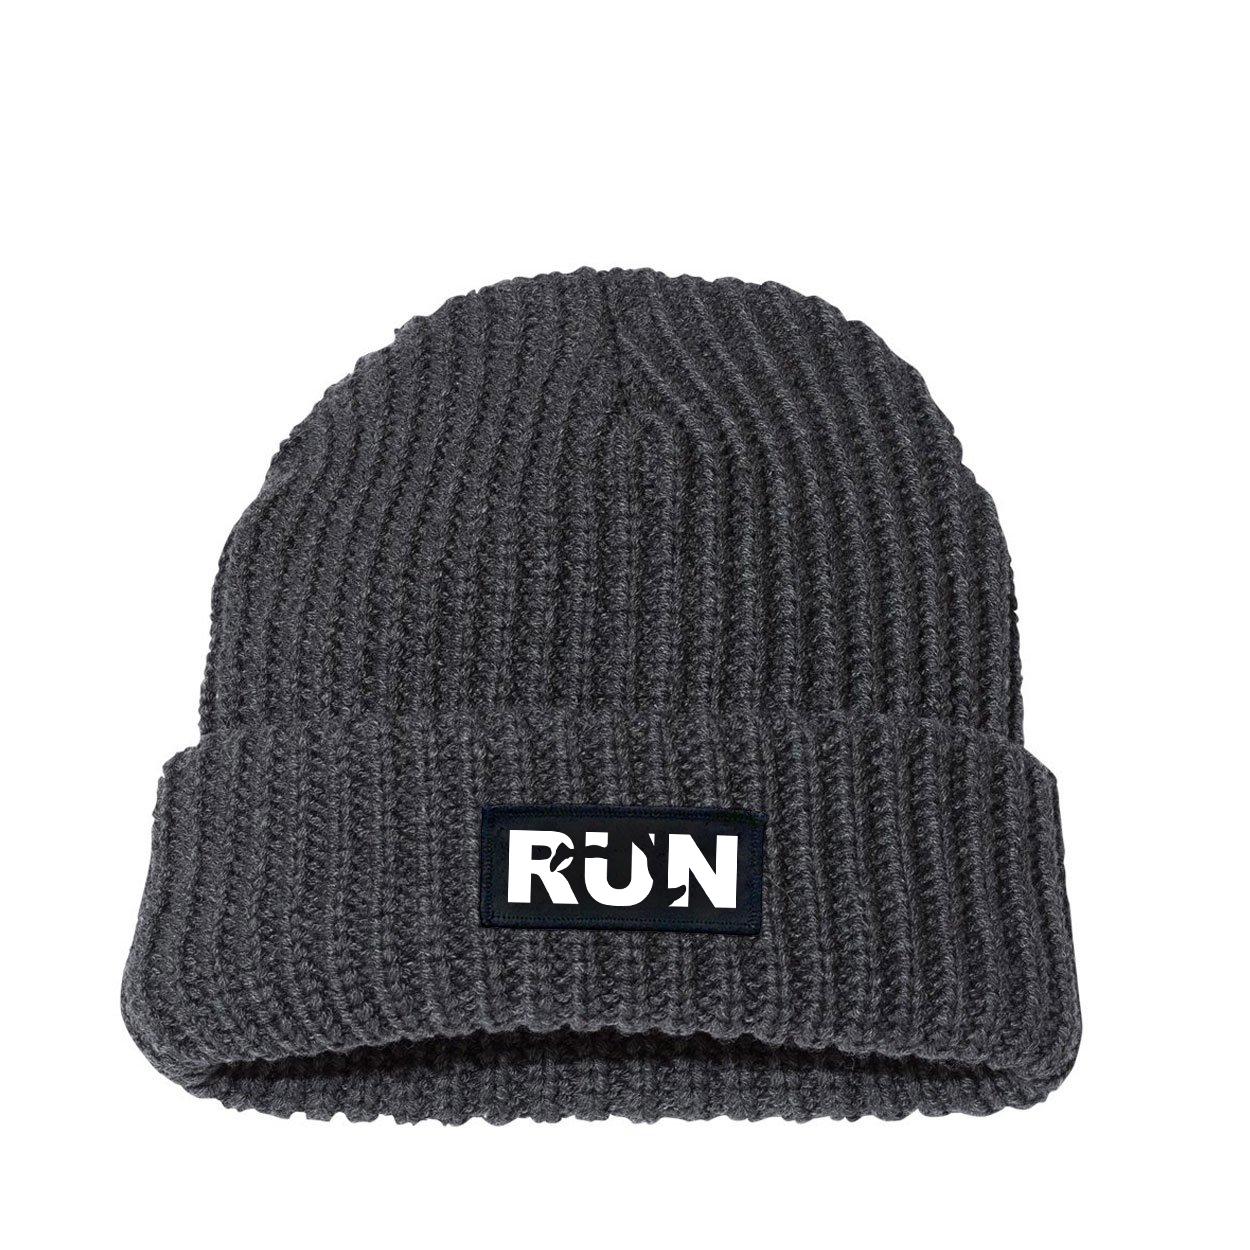 Run Jog Logo Night Out Woven Patch Roll Up Jumbo Chunky Knit Beanie Charcoal (White Logo)